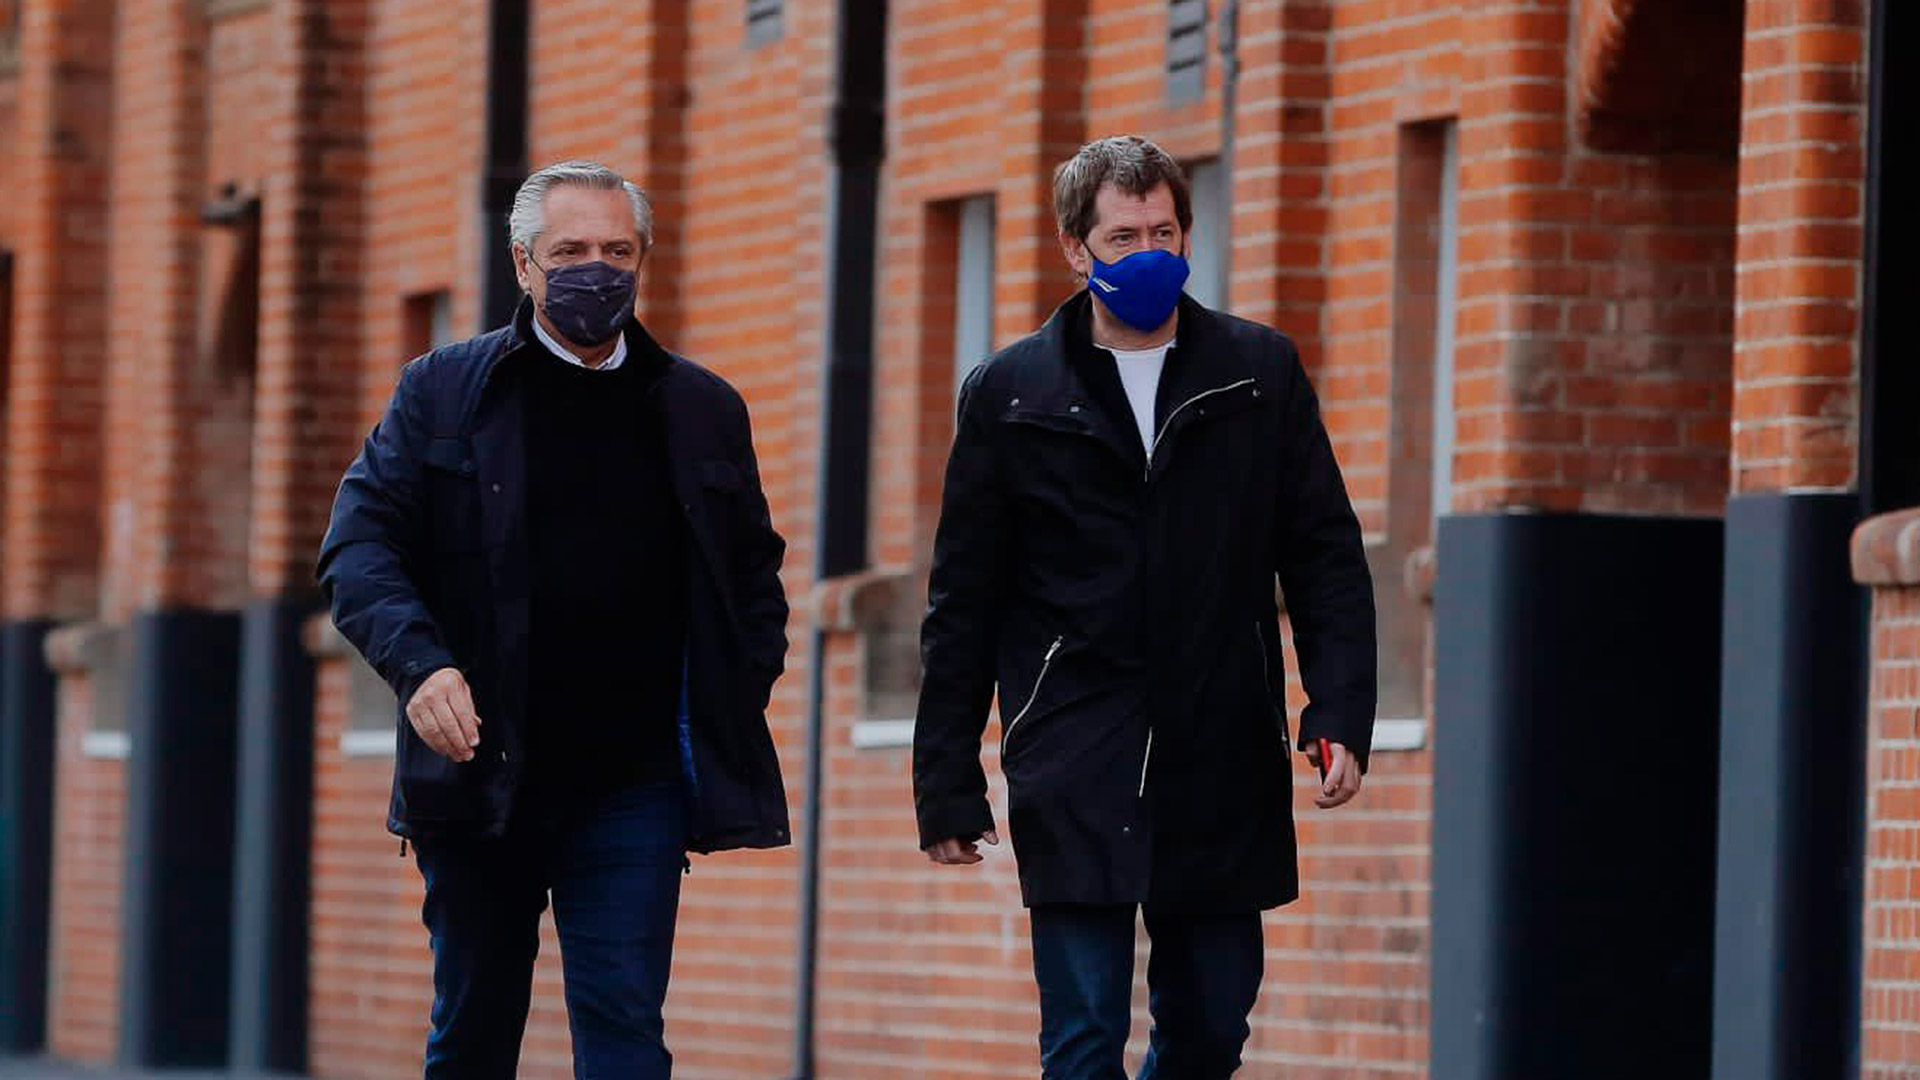 Renunció Juan Pablo Biondi, el vocero de Alberto Fernández apuntado por Cristina Kirchner